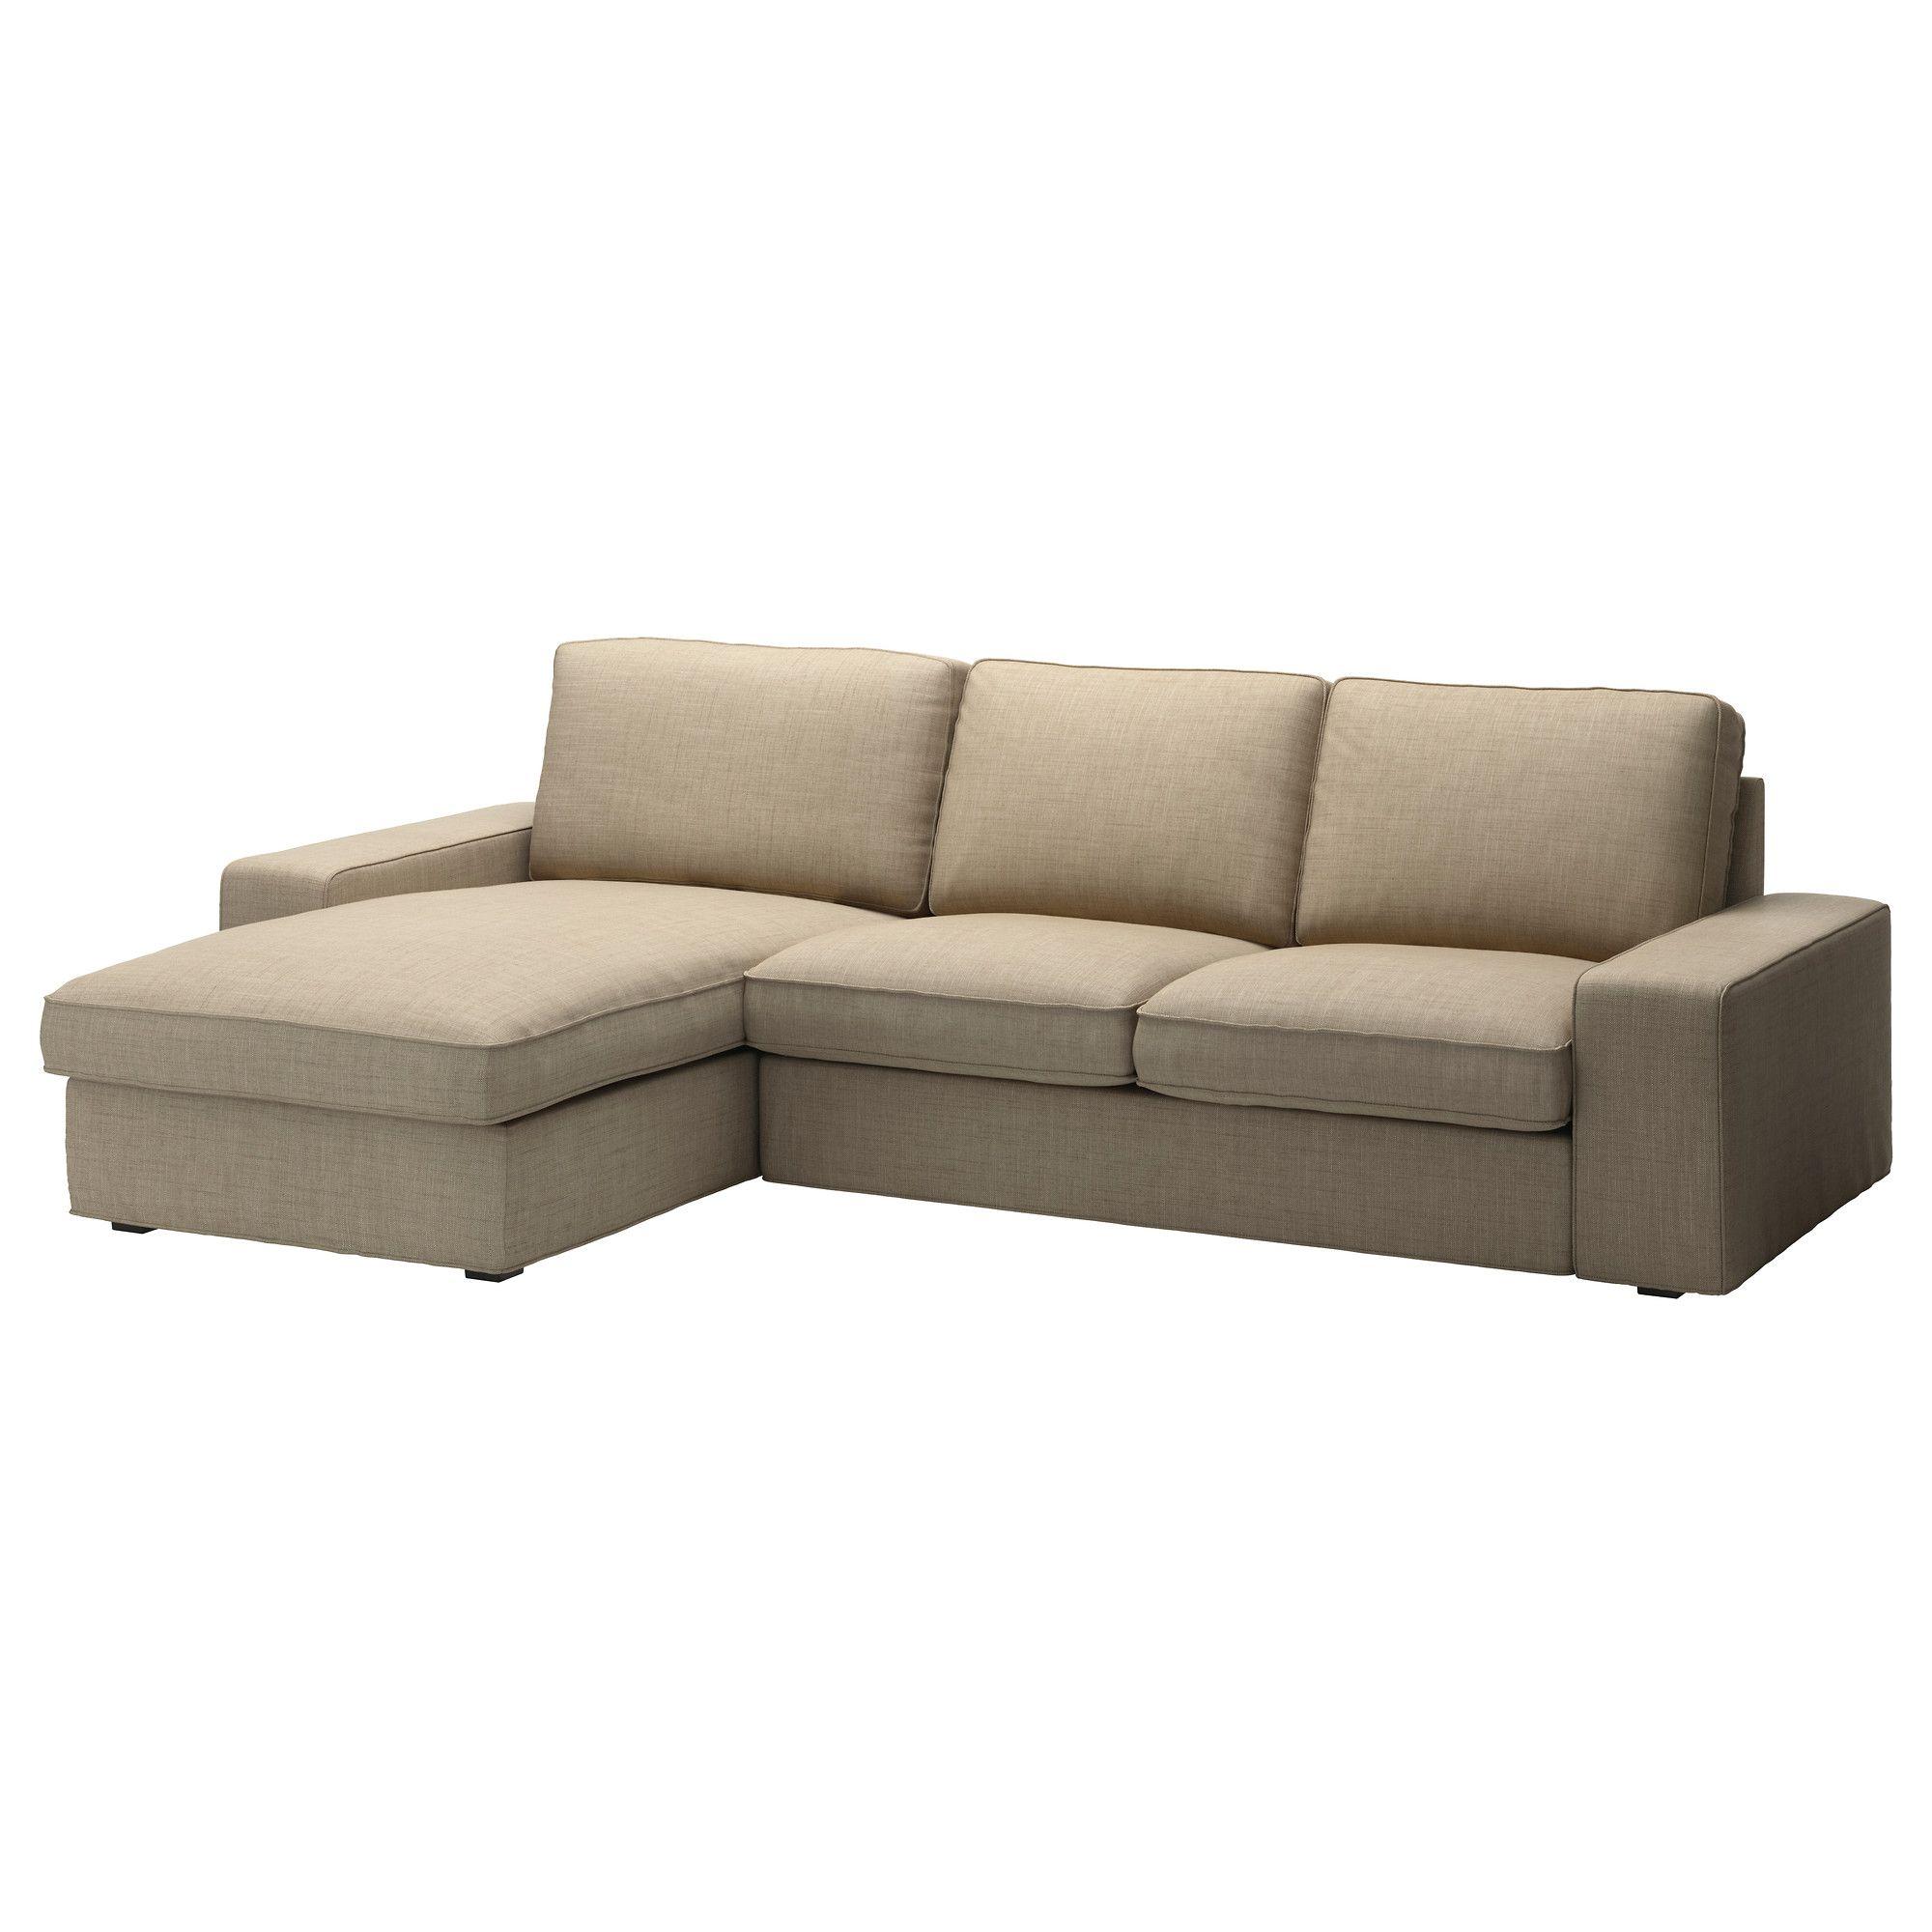 Kivik Loveseat And Chaise Lounge Isunda Beige Ikea